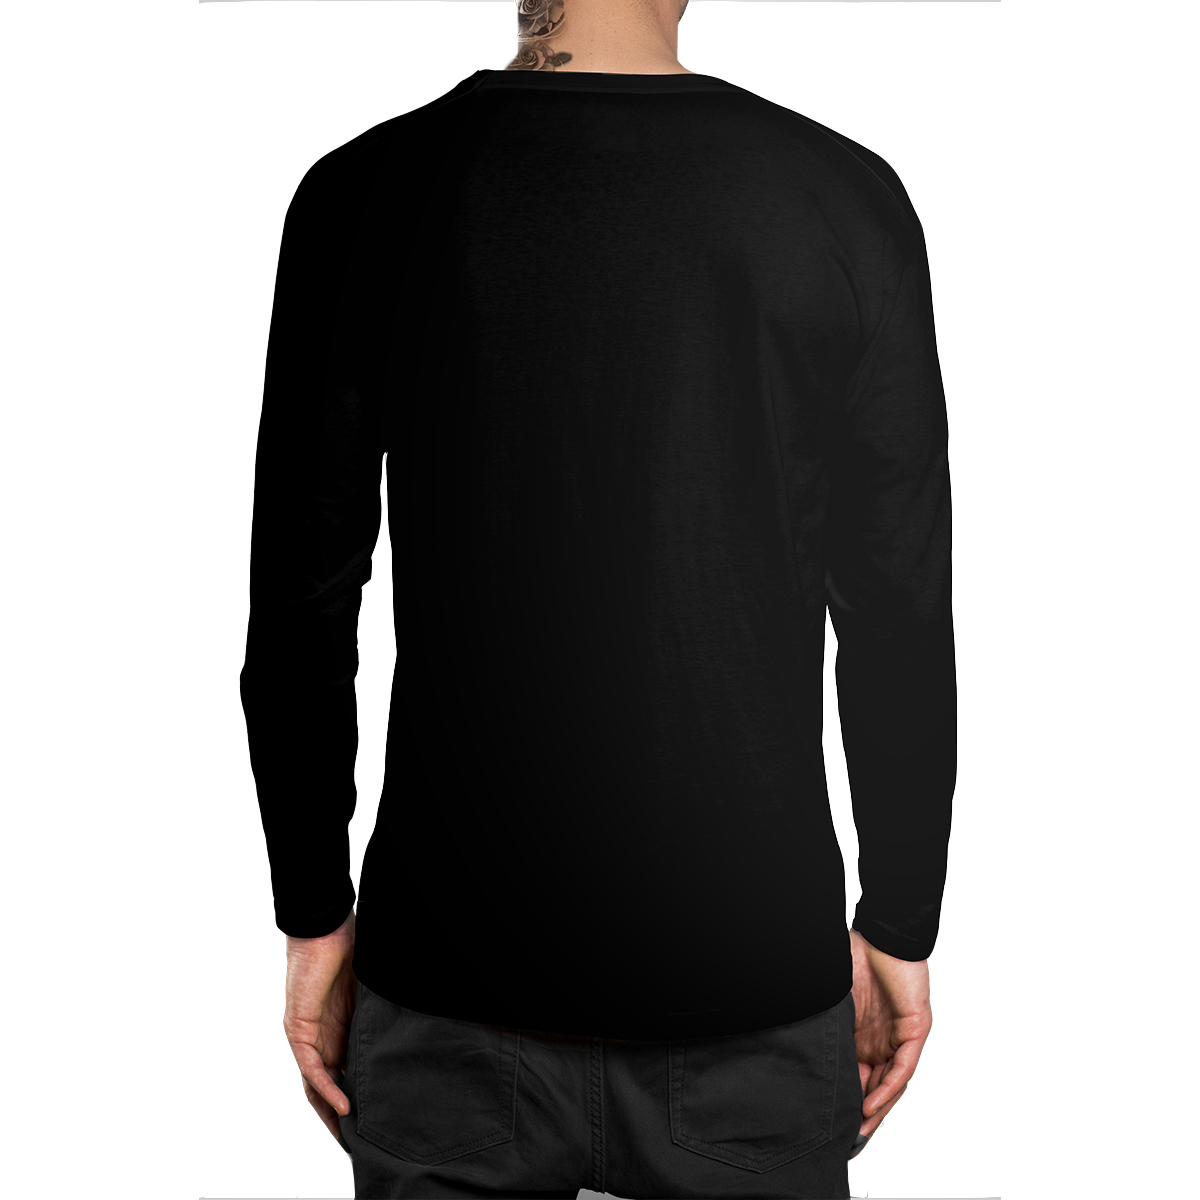 Stompy Camiseta Manga Longa Modelo 37